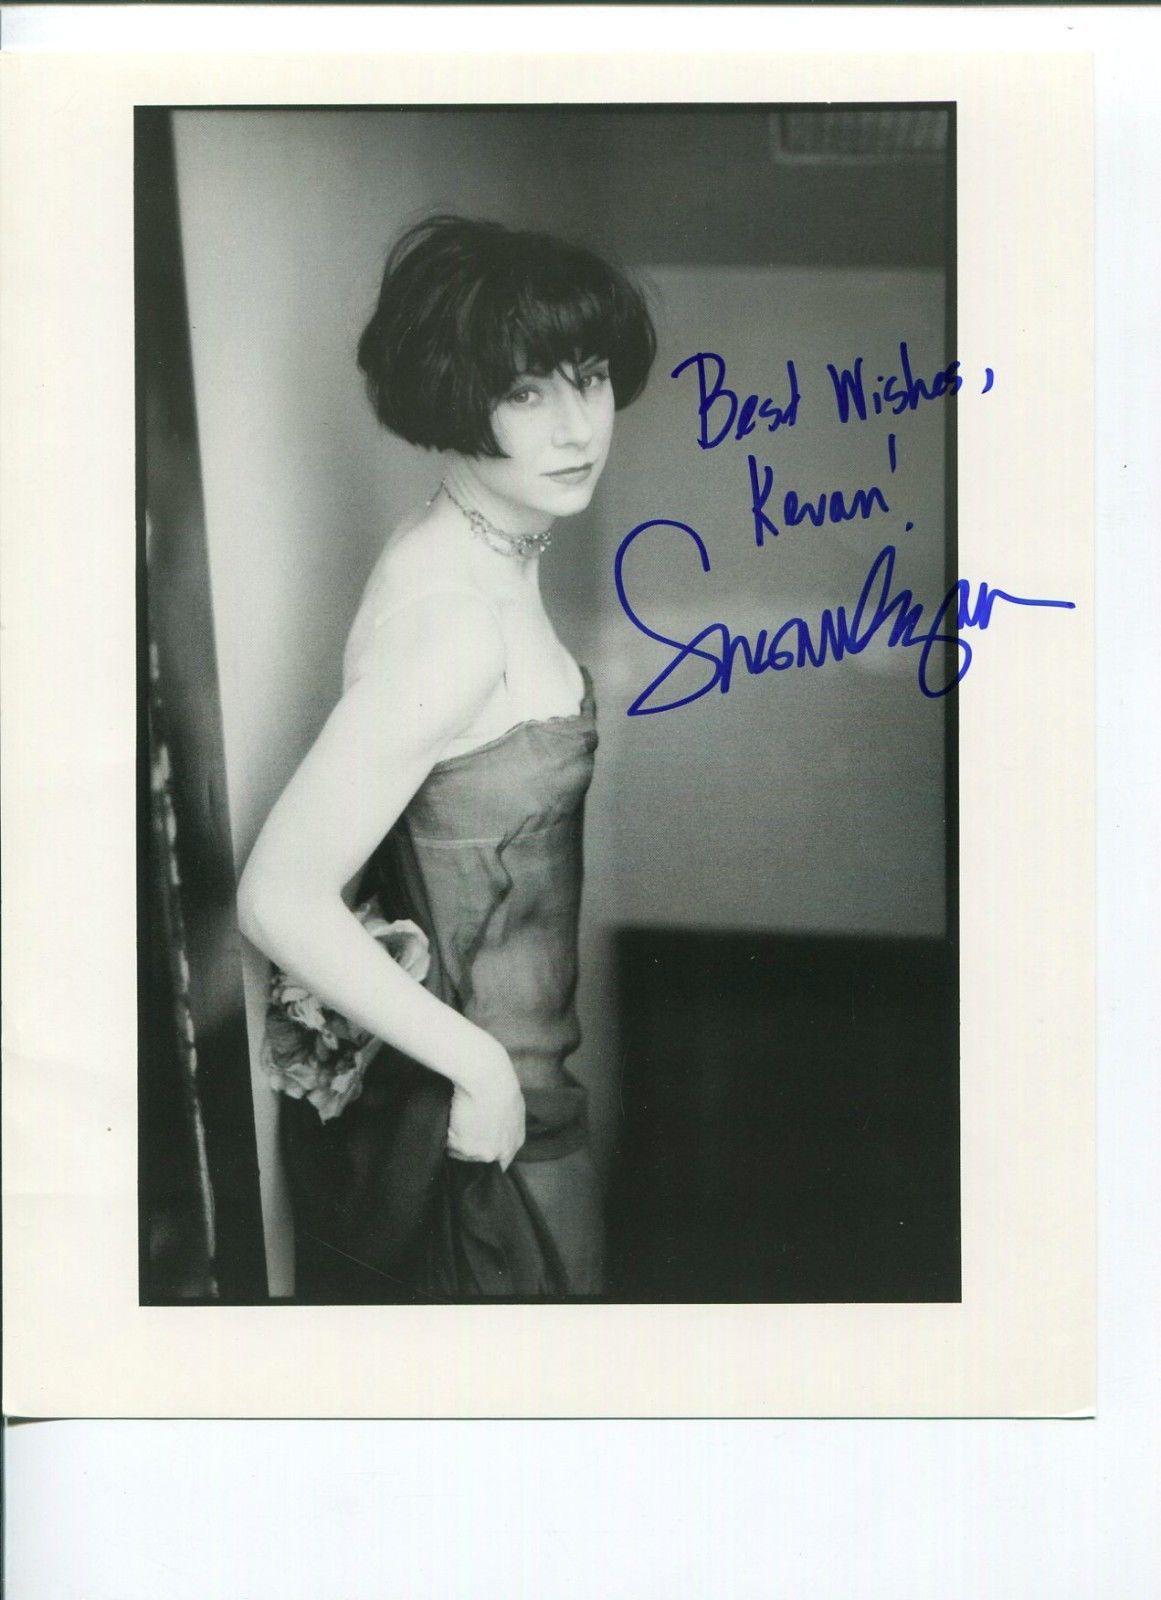 Susan Egan Disney Hercules Beauty and the Beast Nikki Signed Autograph Photo